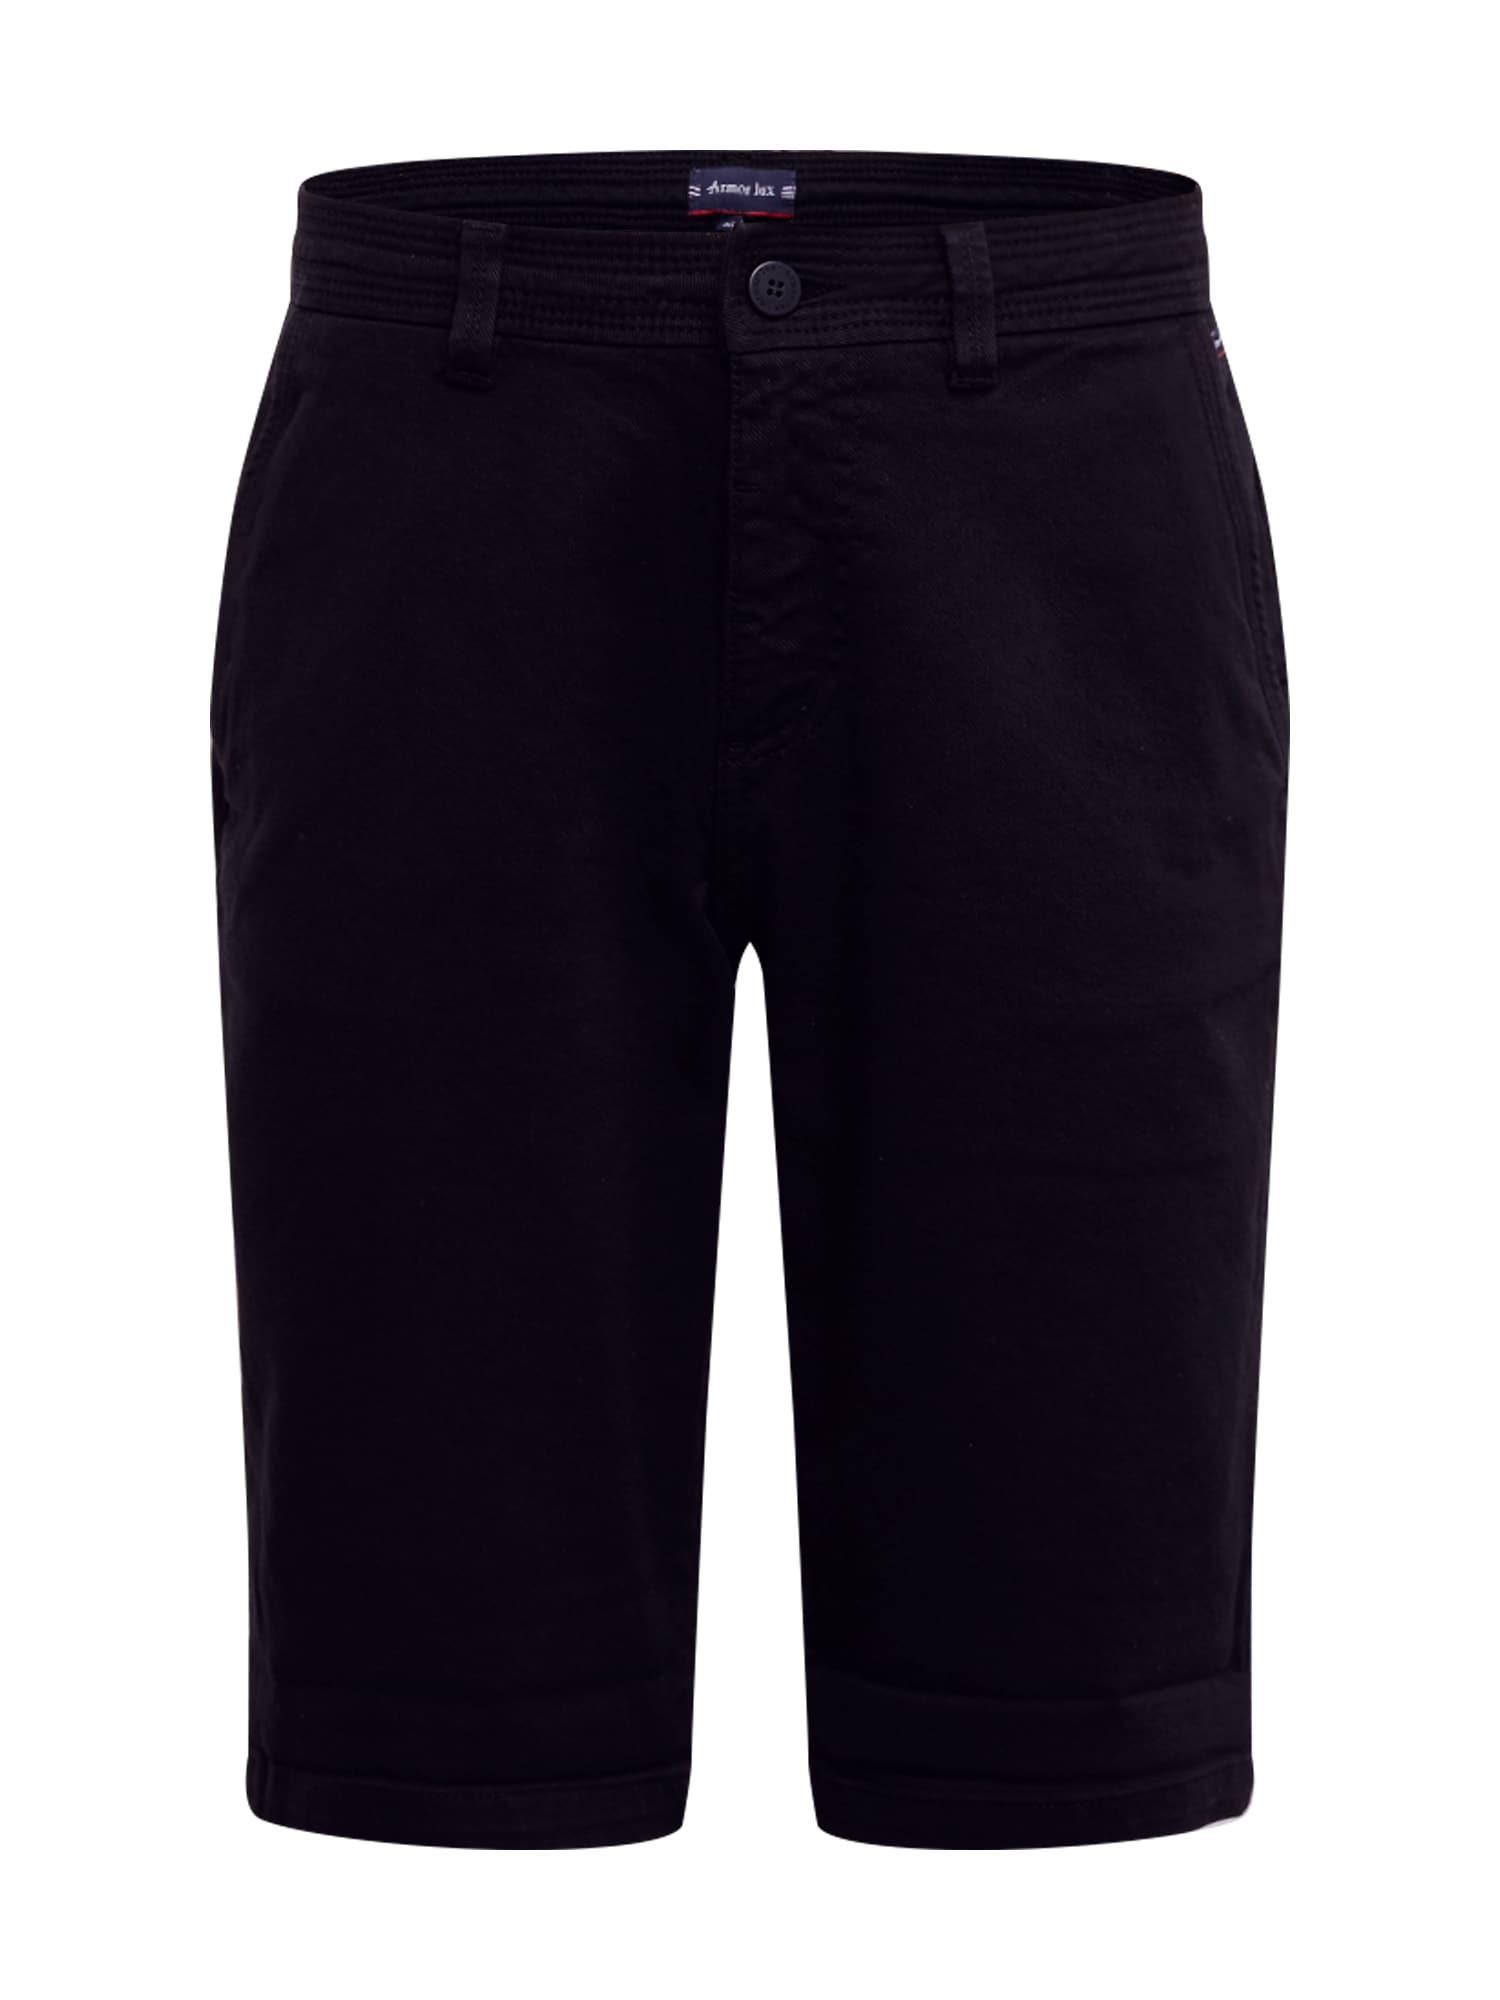 Armor Lux Kelnės 'Caboteur Homme' juoda